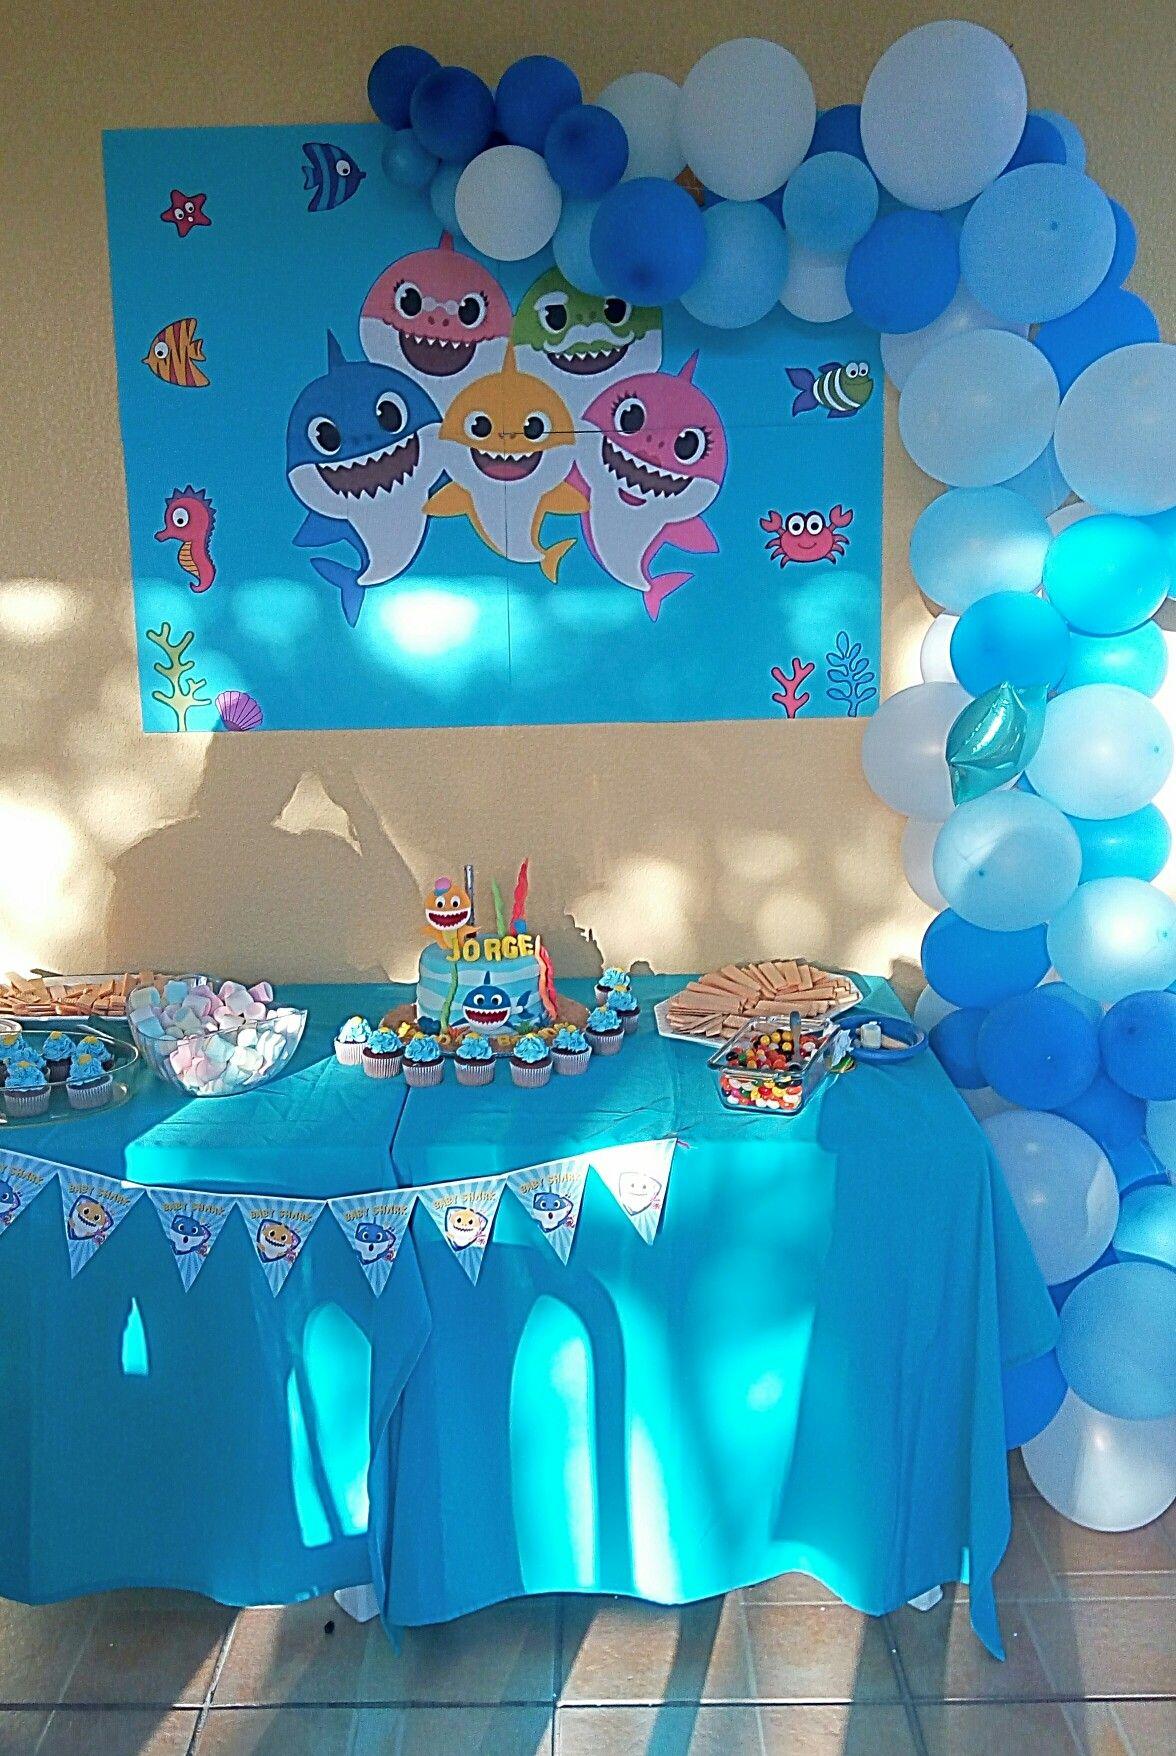 Babyshark Party Pinkfong Shark Themed Birthday Party Baby Boy Birthday Shark Theme Birthday